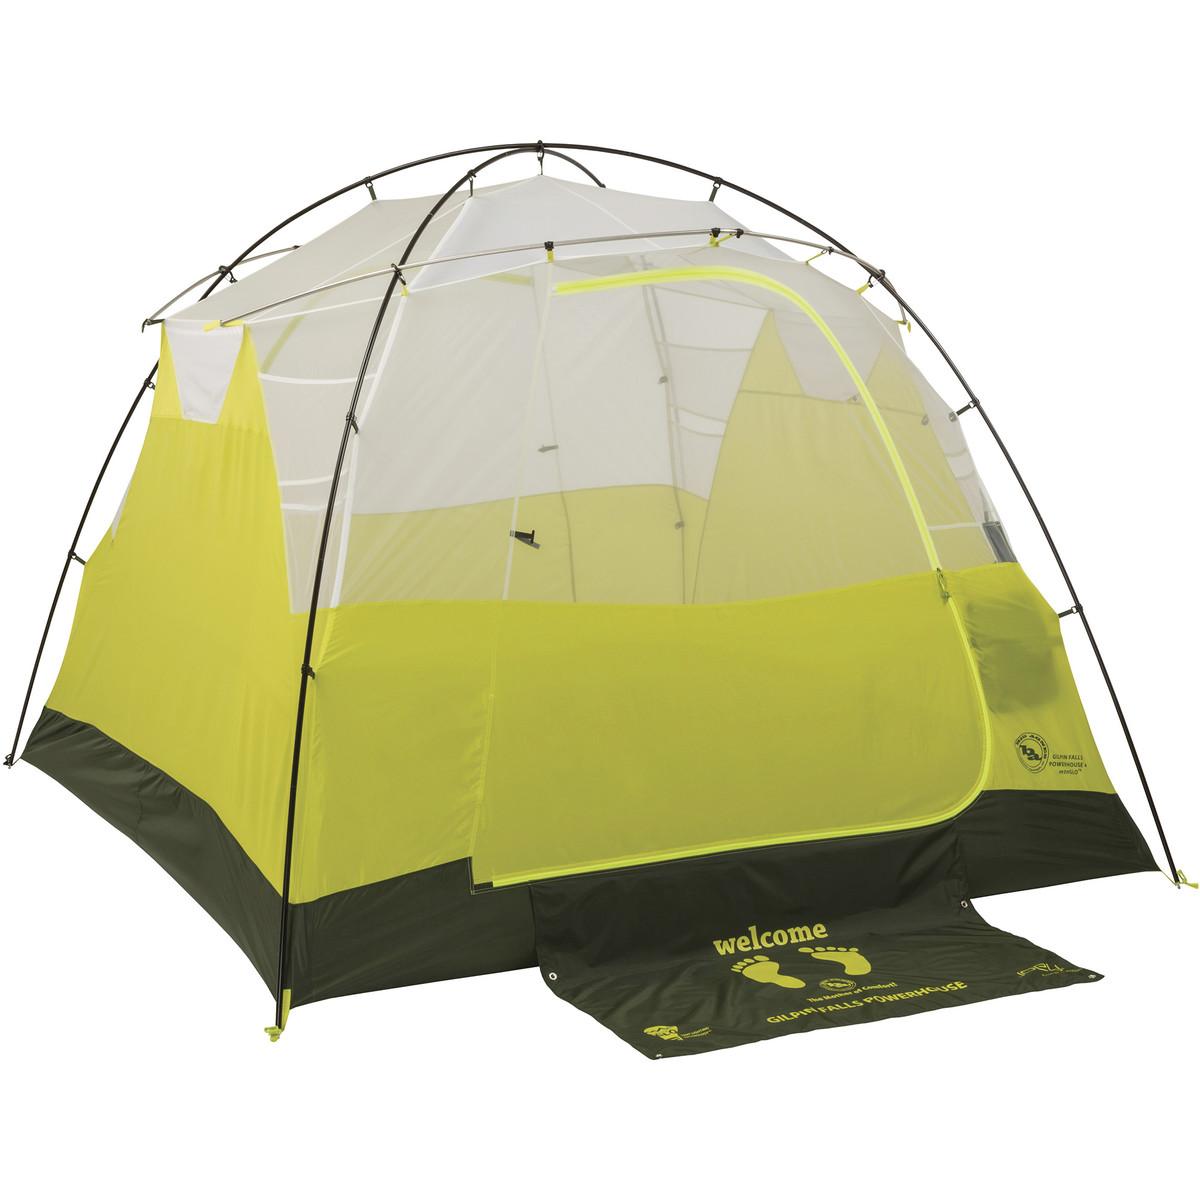 Big Agnes Gilpin Falls 4 mtnGLO  sc 1 st  Trailspace & Three-Season Tent Reviews - Trailspace.com